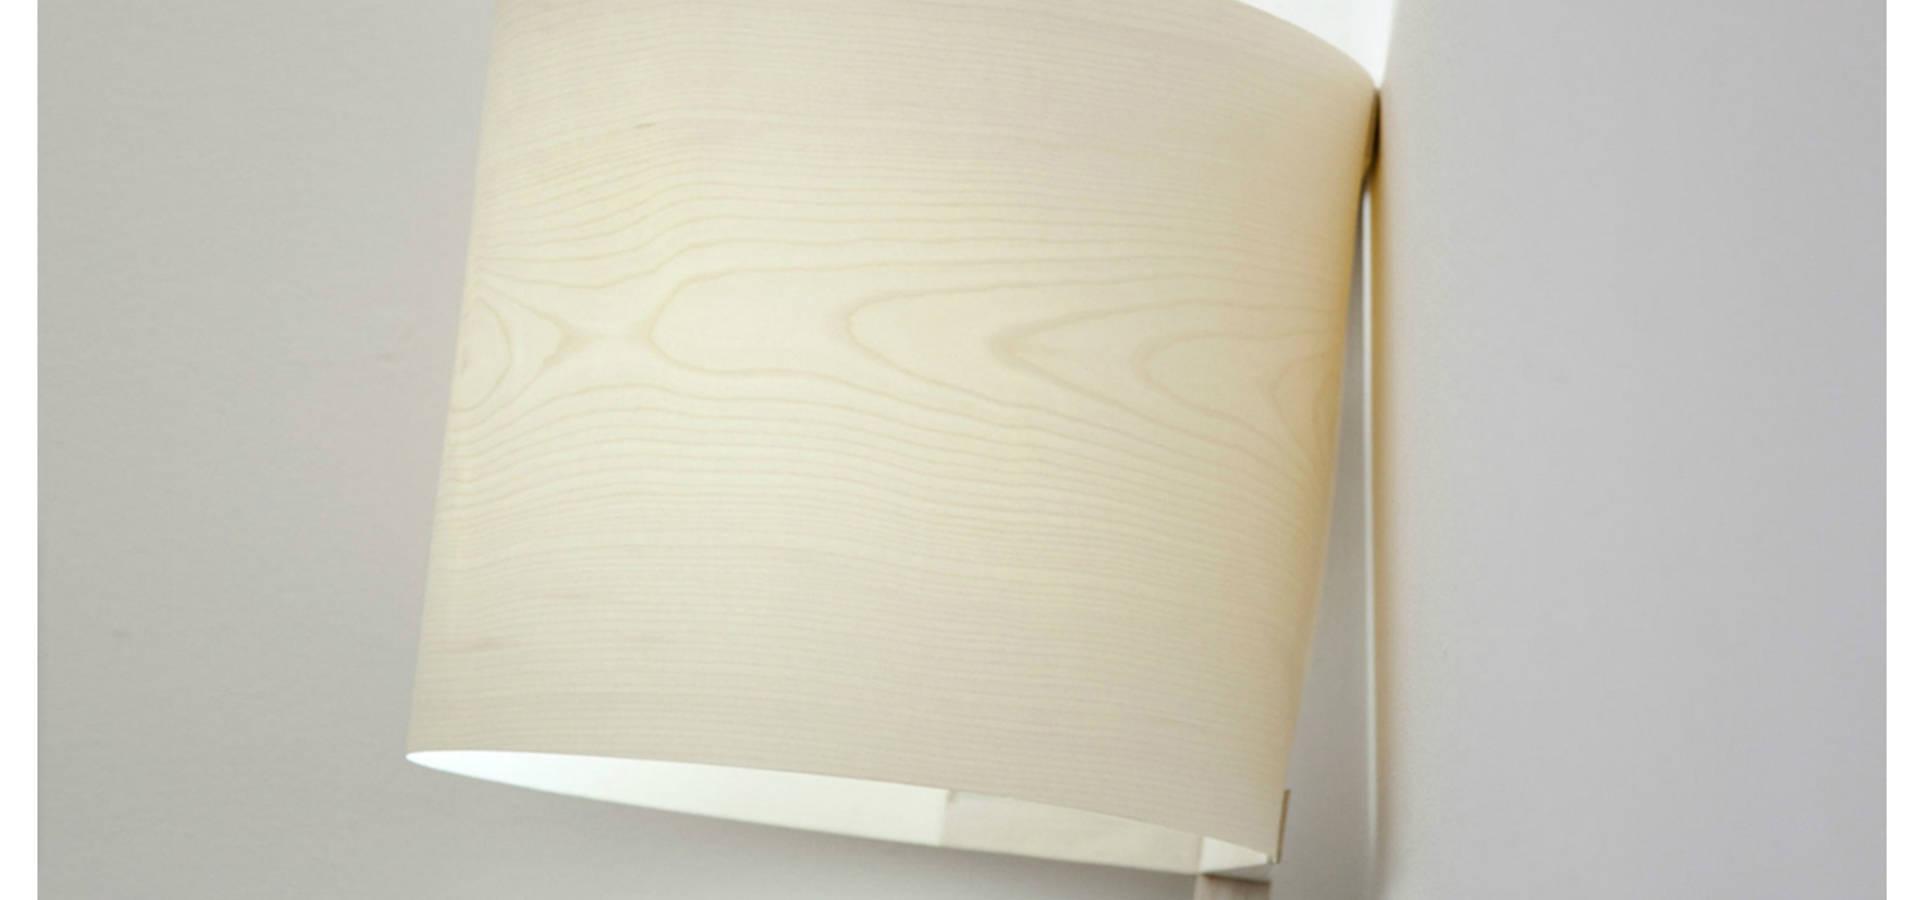 Lucas Stoppele Design